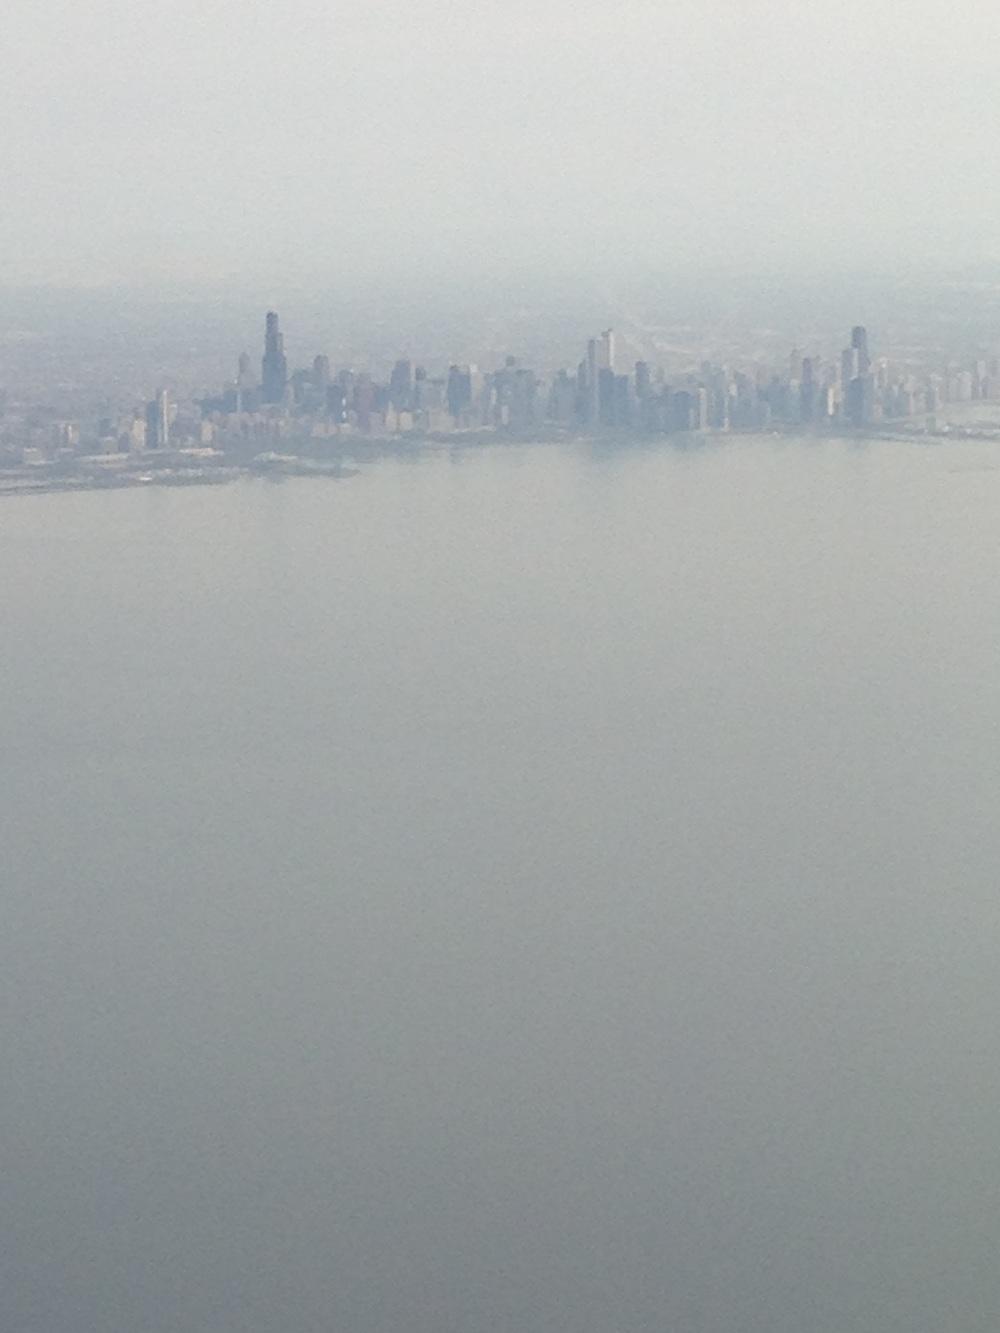 Plane-Chicago2.jpg